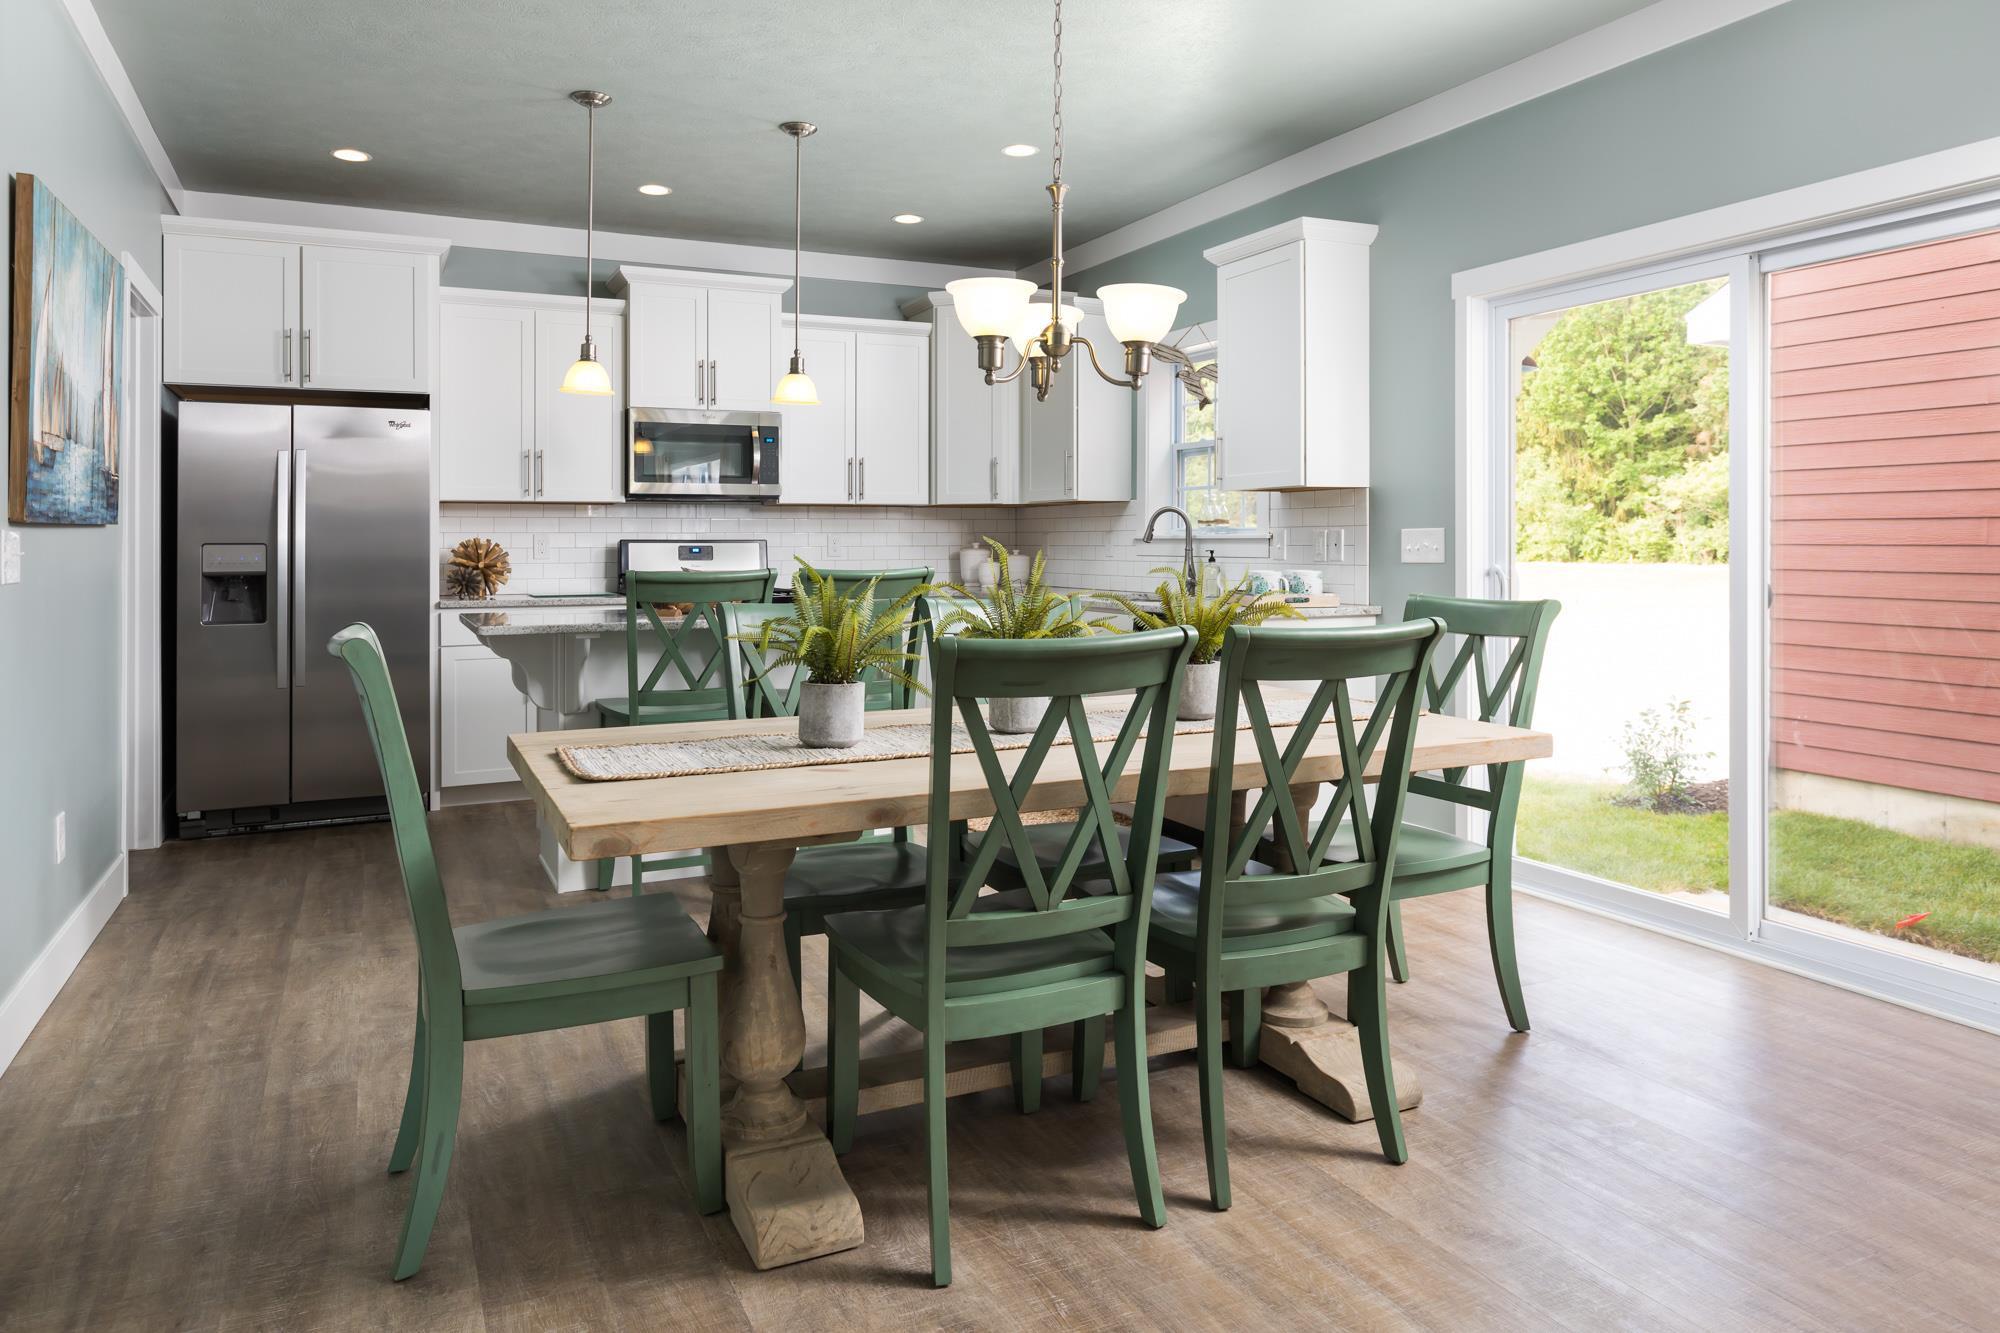 Kitchen featured in the Elements 2390 By Allen Edwin Homes in Benton Harbor, MI